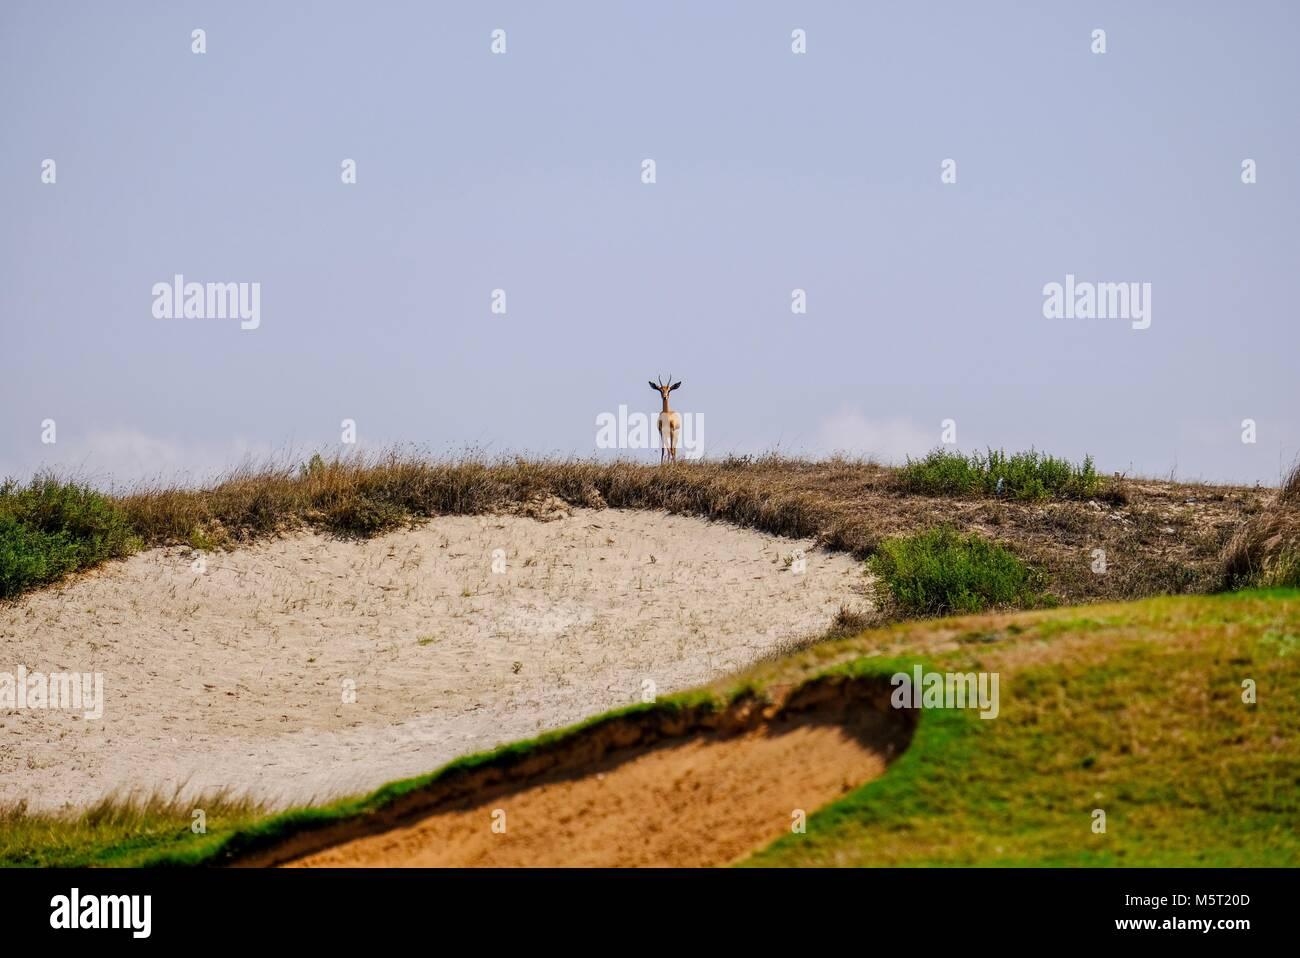 Saadiyat Island Abu Dhabi, UAE - 26th February, 2018: Alone Arabian sand Gazelle staring at camera . In Arabic Gazelle - Stock Image